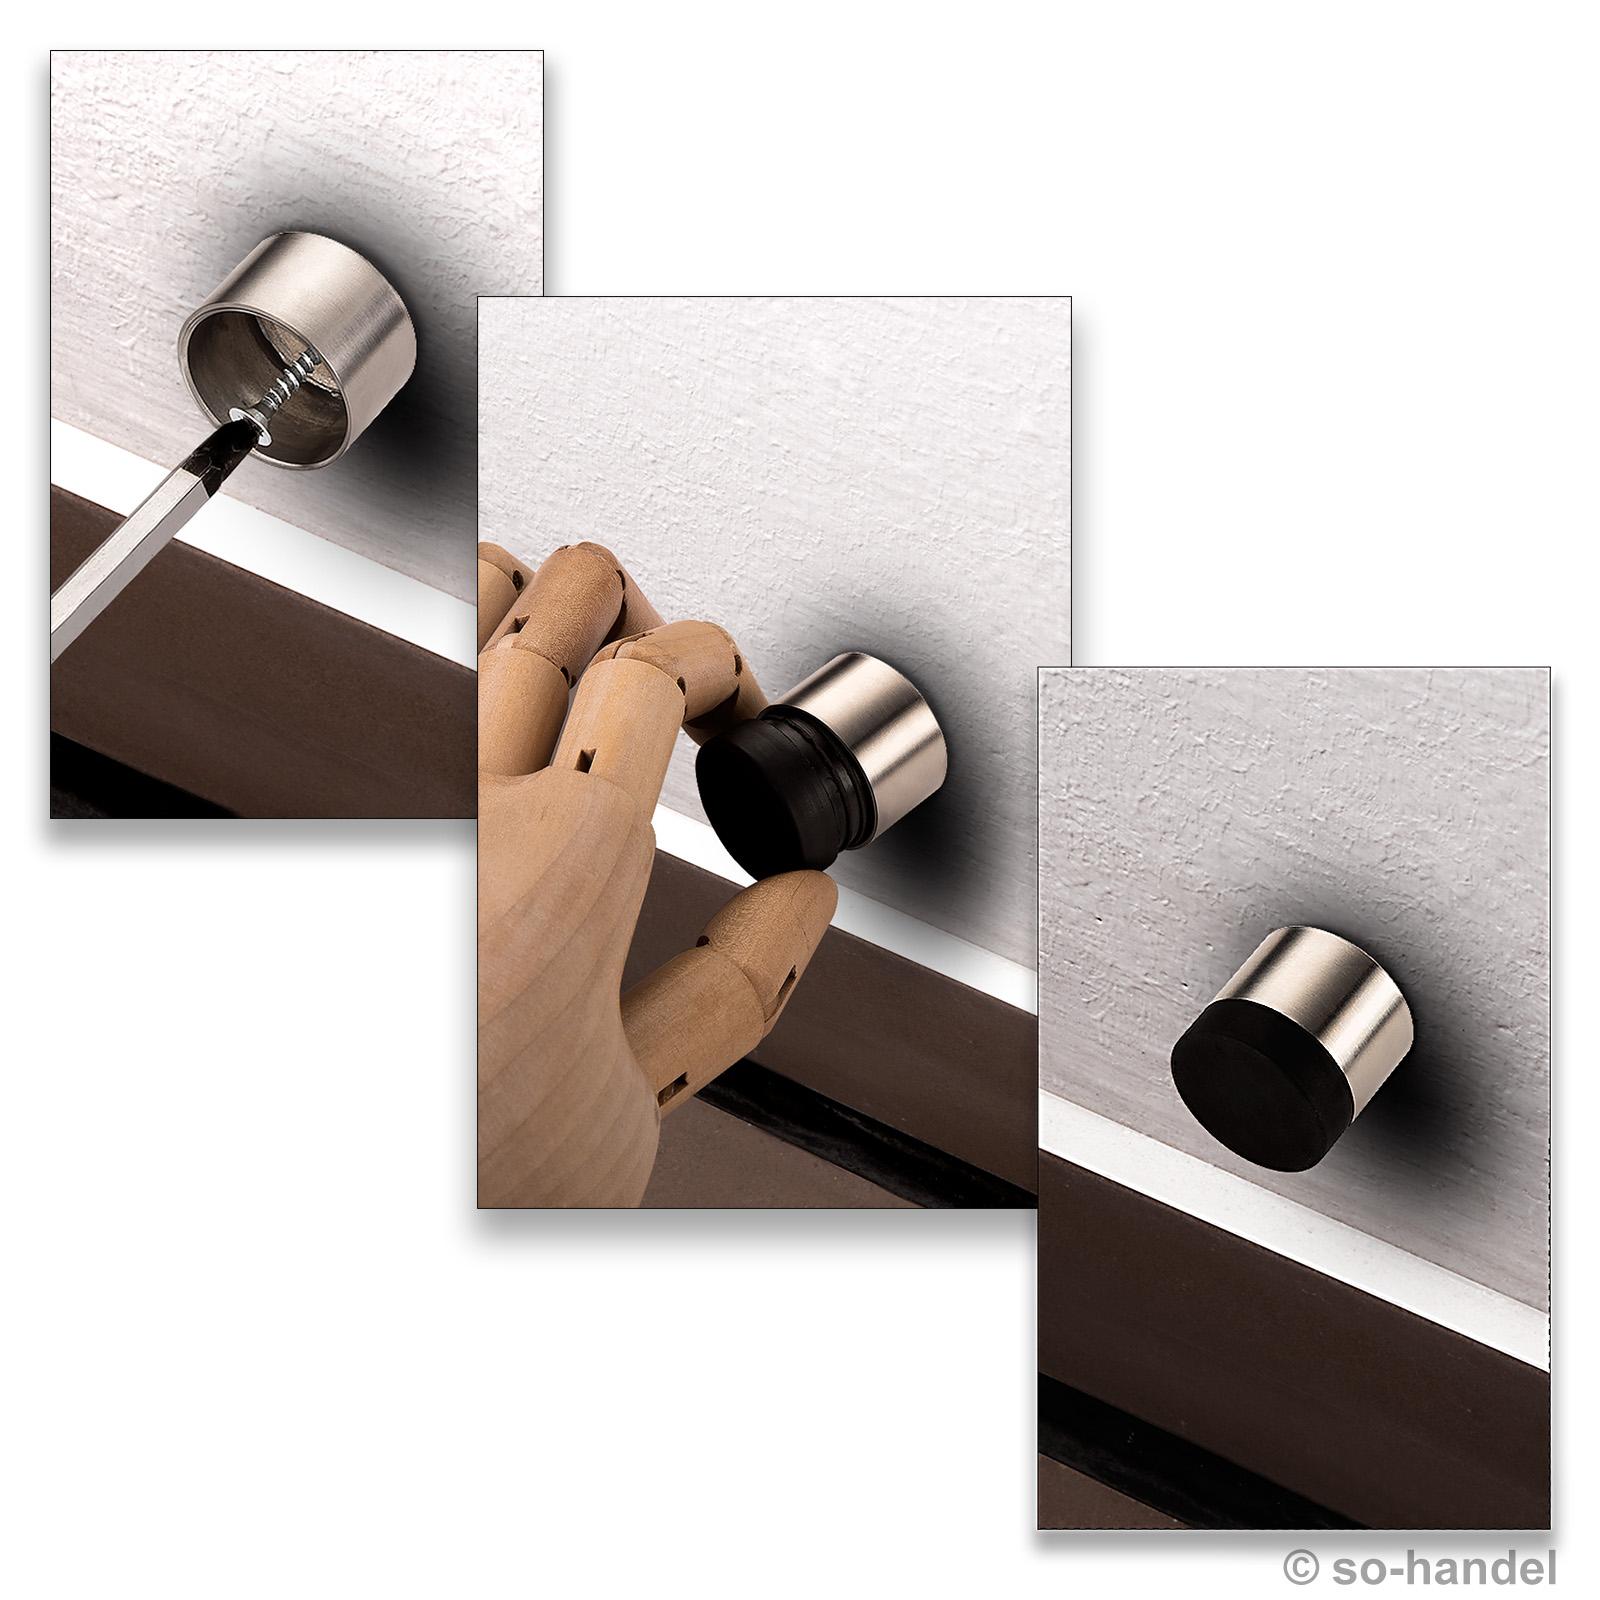 t rstopper wandt rstopper anschlagpuffer t ranschlagpuffer. Black Bedroom Furniture Sets. Home Design Ideas